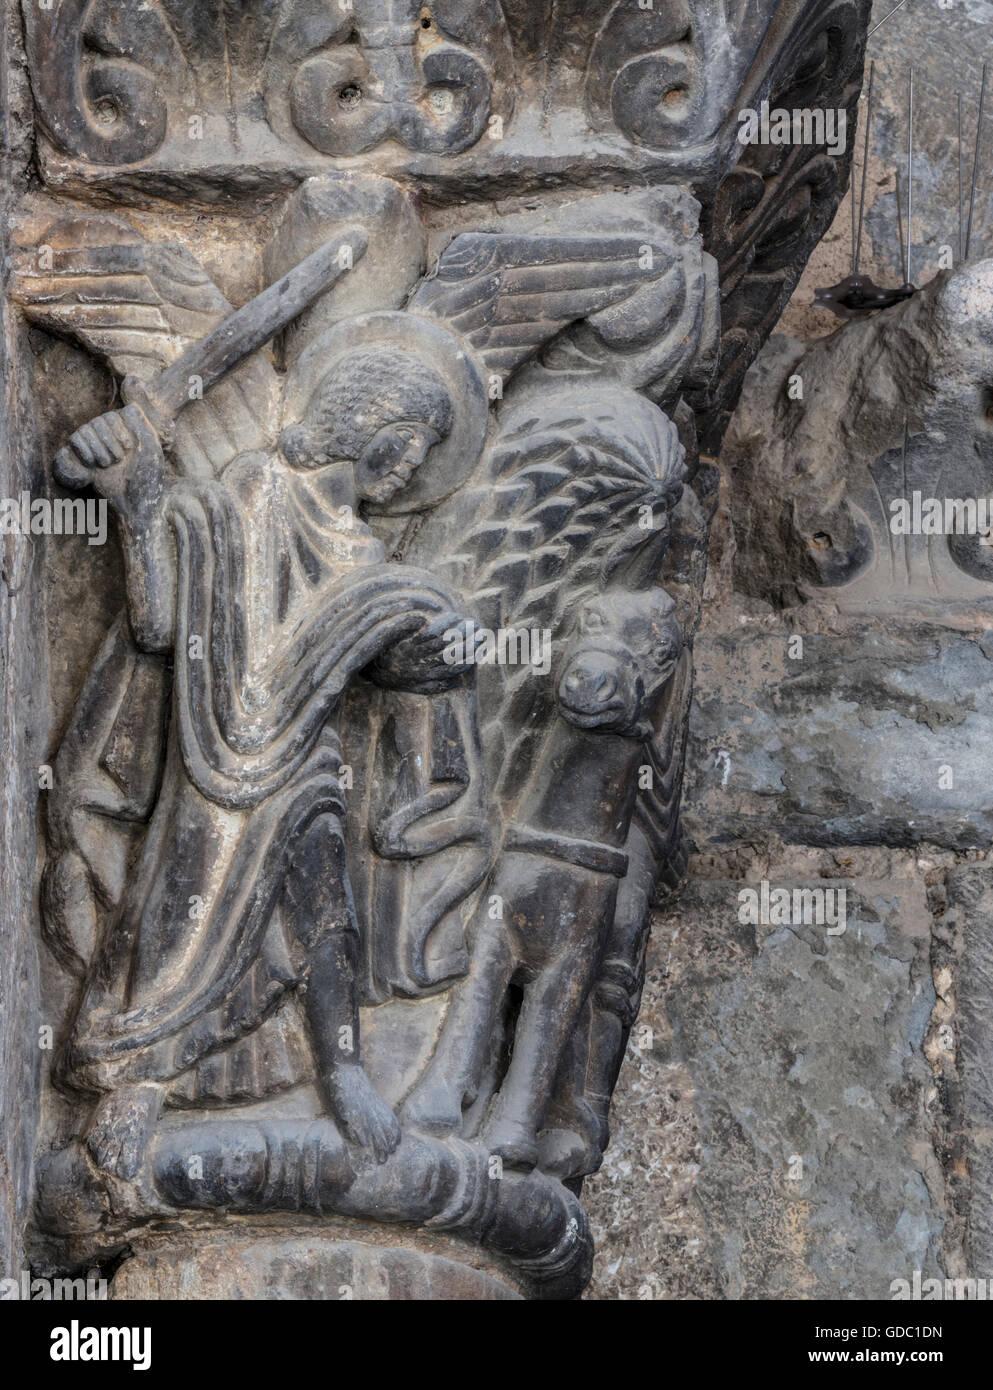 Jaca, Provinz Huesca, Aragon, Spanien.  Historisierte Hauptstadt außerhalb der romanischen Catedral de San Stockbild